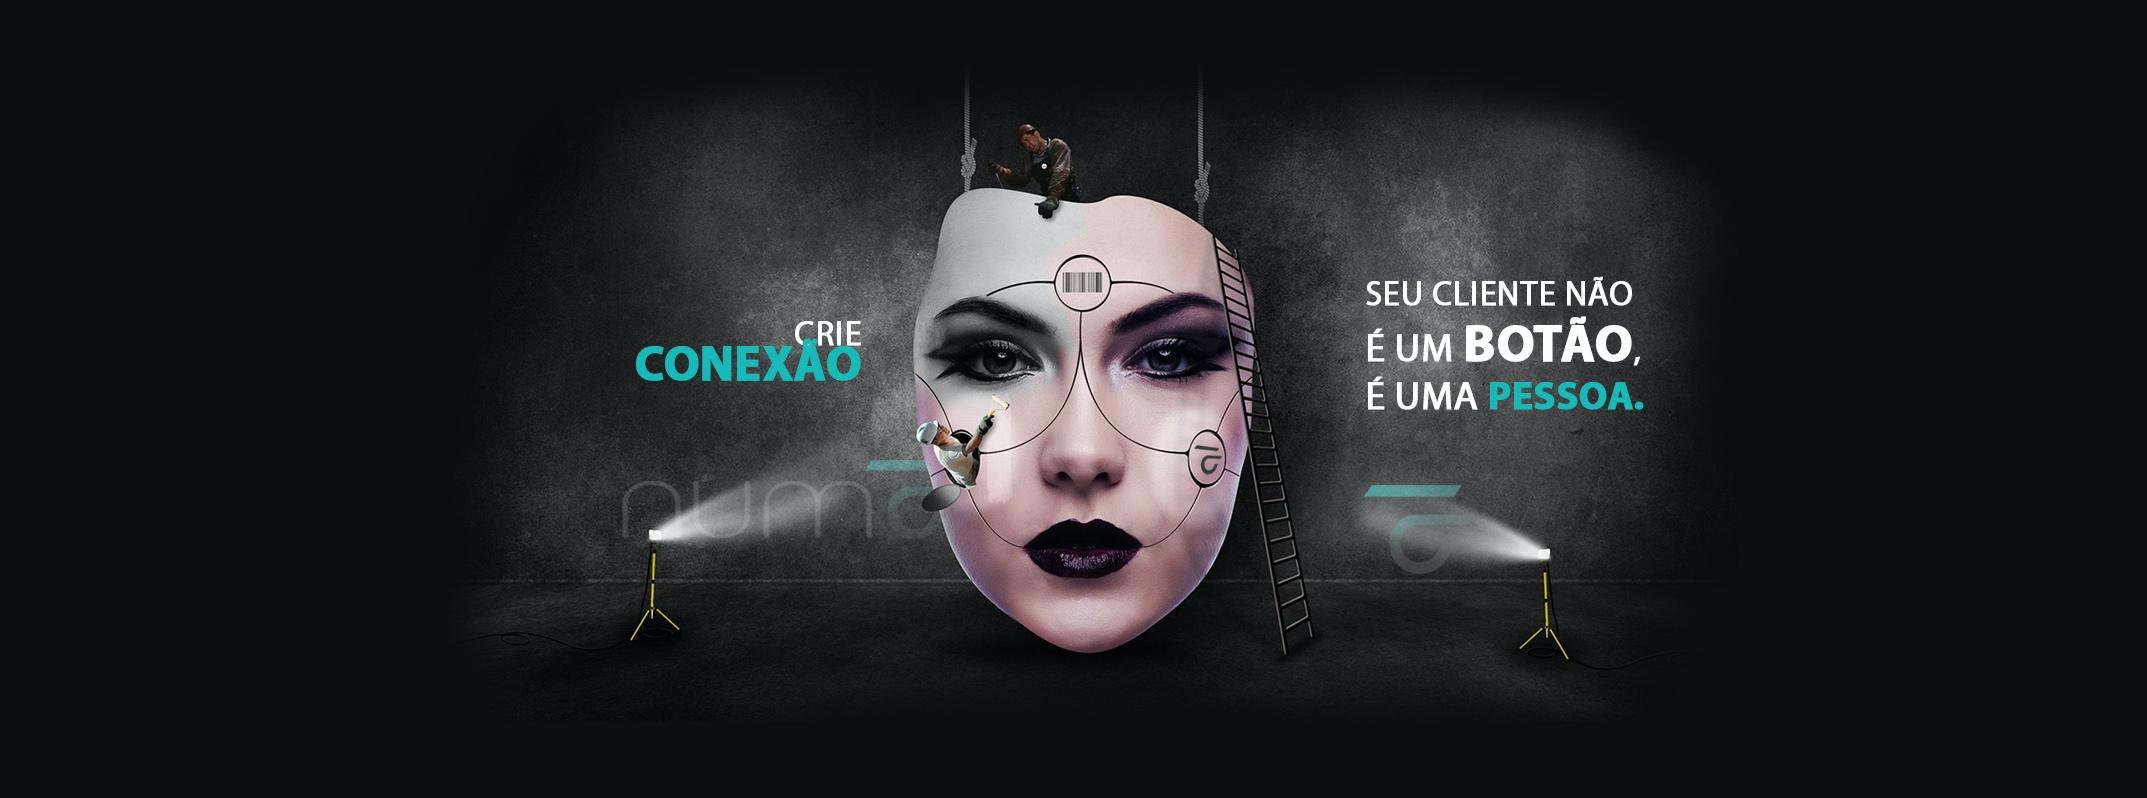 Agência Nume Company (@numecompany) Cover Image